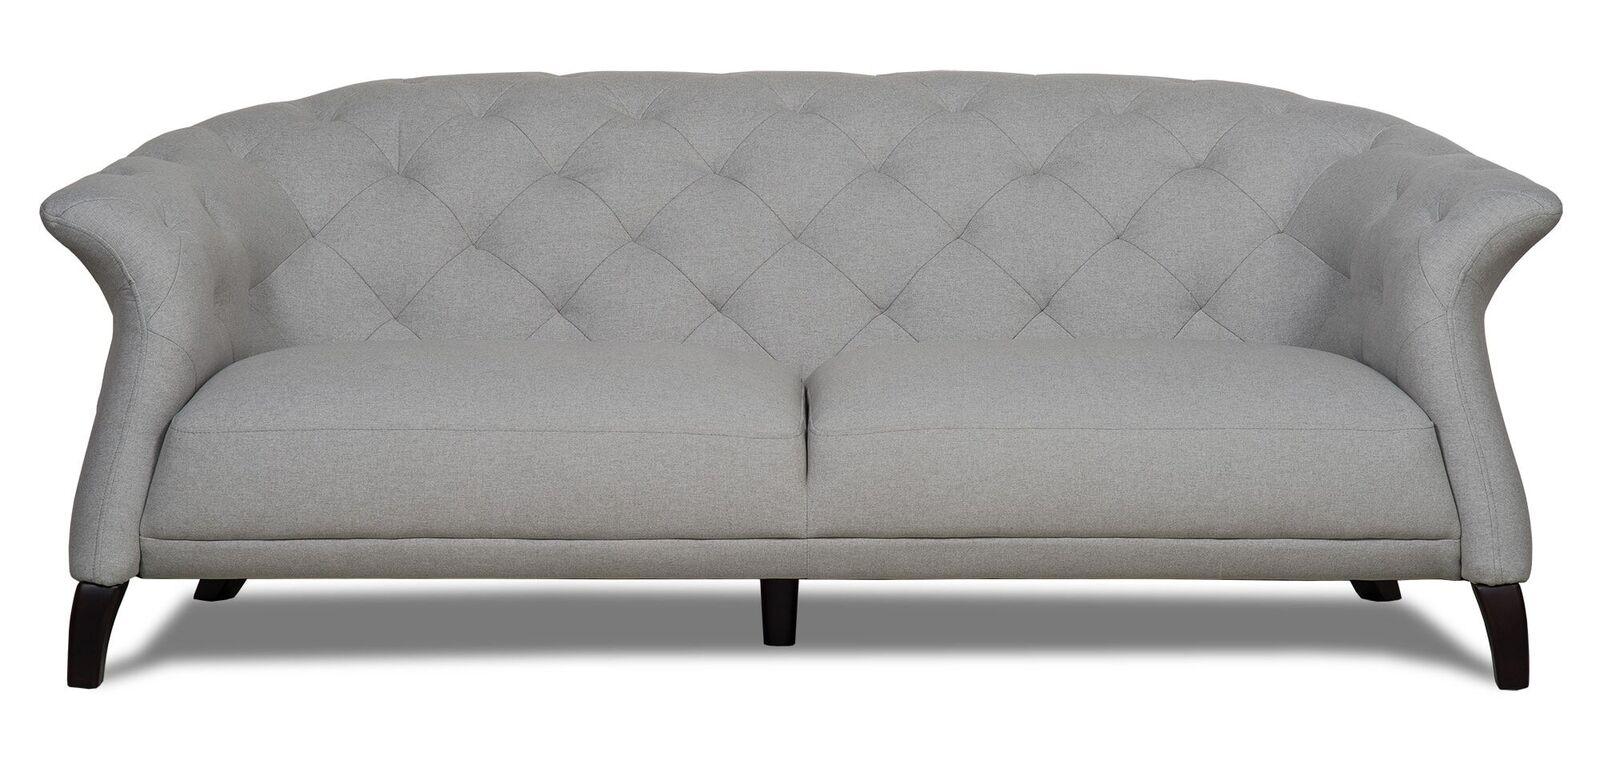 Crispin 4 Seater Modern Chesterfield Sofa Grey Modern Chesterfield